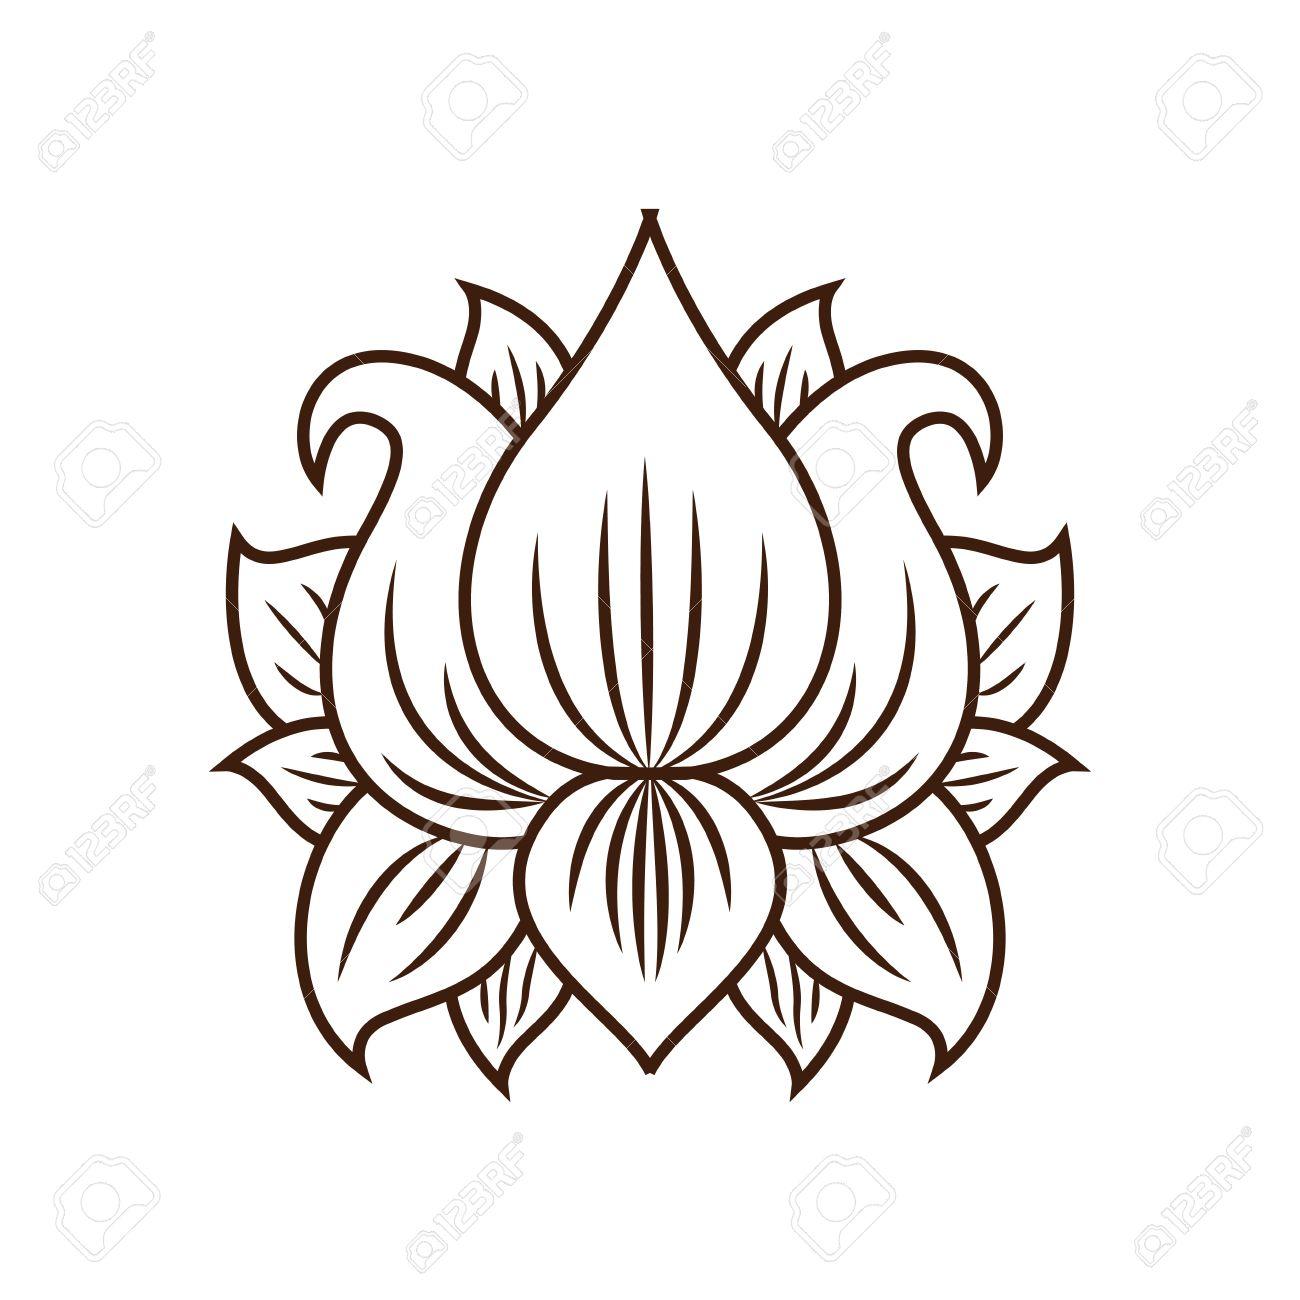 Fleur De Lotus Tatouage Clipart Fleur Lotus Tatouage Fotosearch